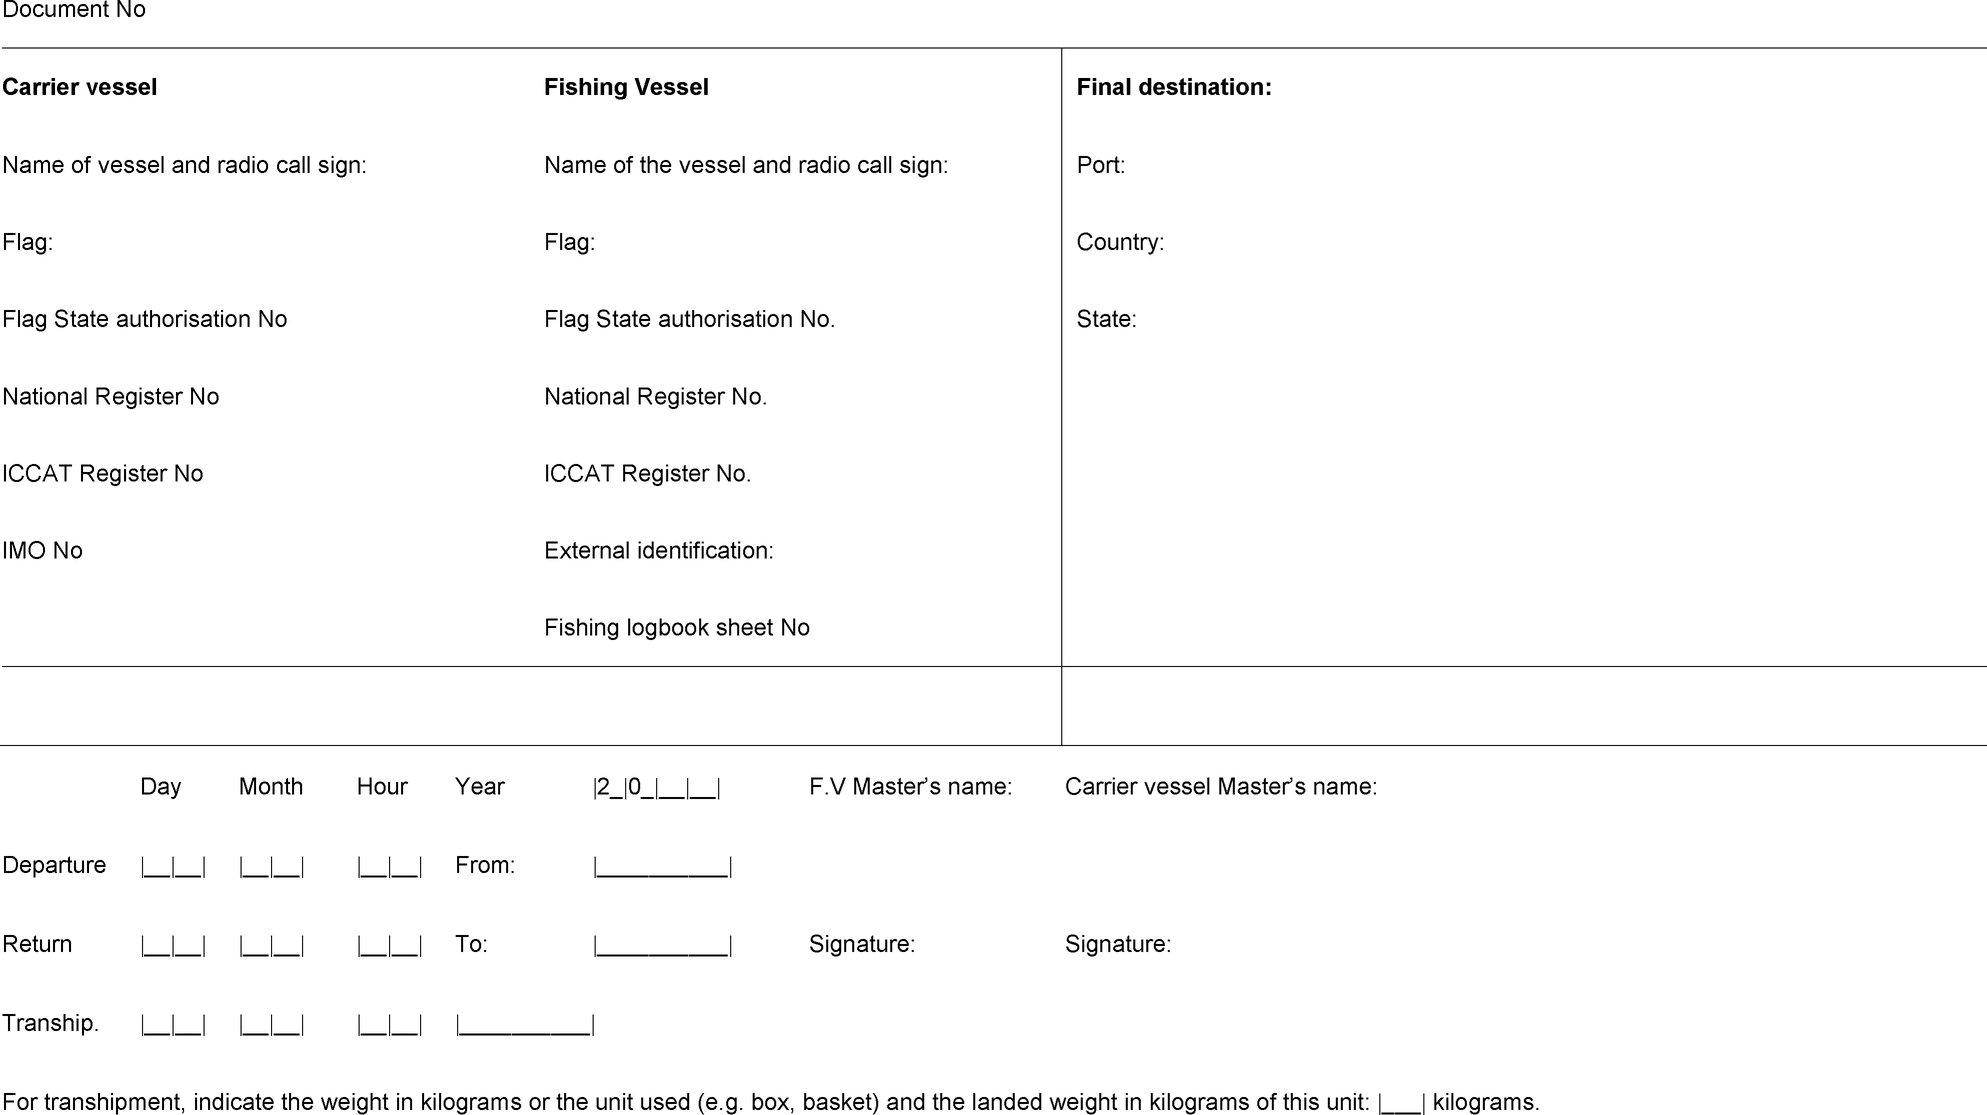 20210428-P9_TA(2021)0142_NL-p0000002.png